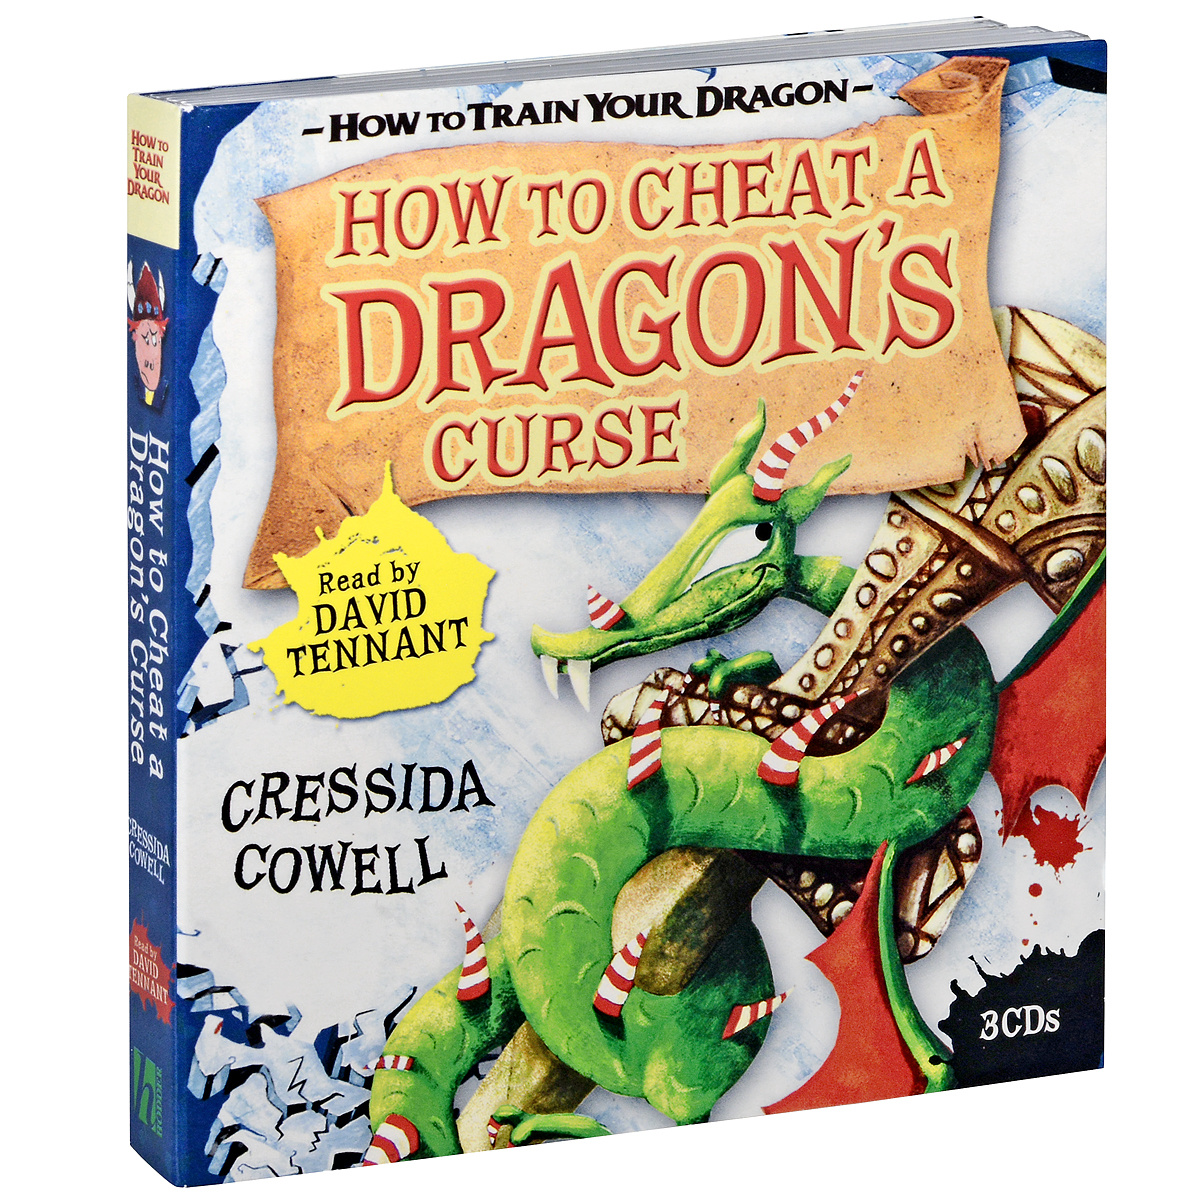 How to Cheat a Dragon's Curse (аудиокнига на 3 CD) | Коуэлл Крессида #1